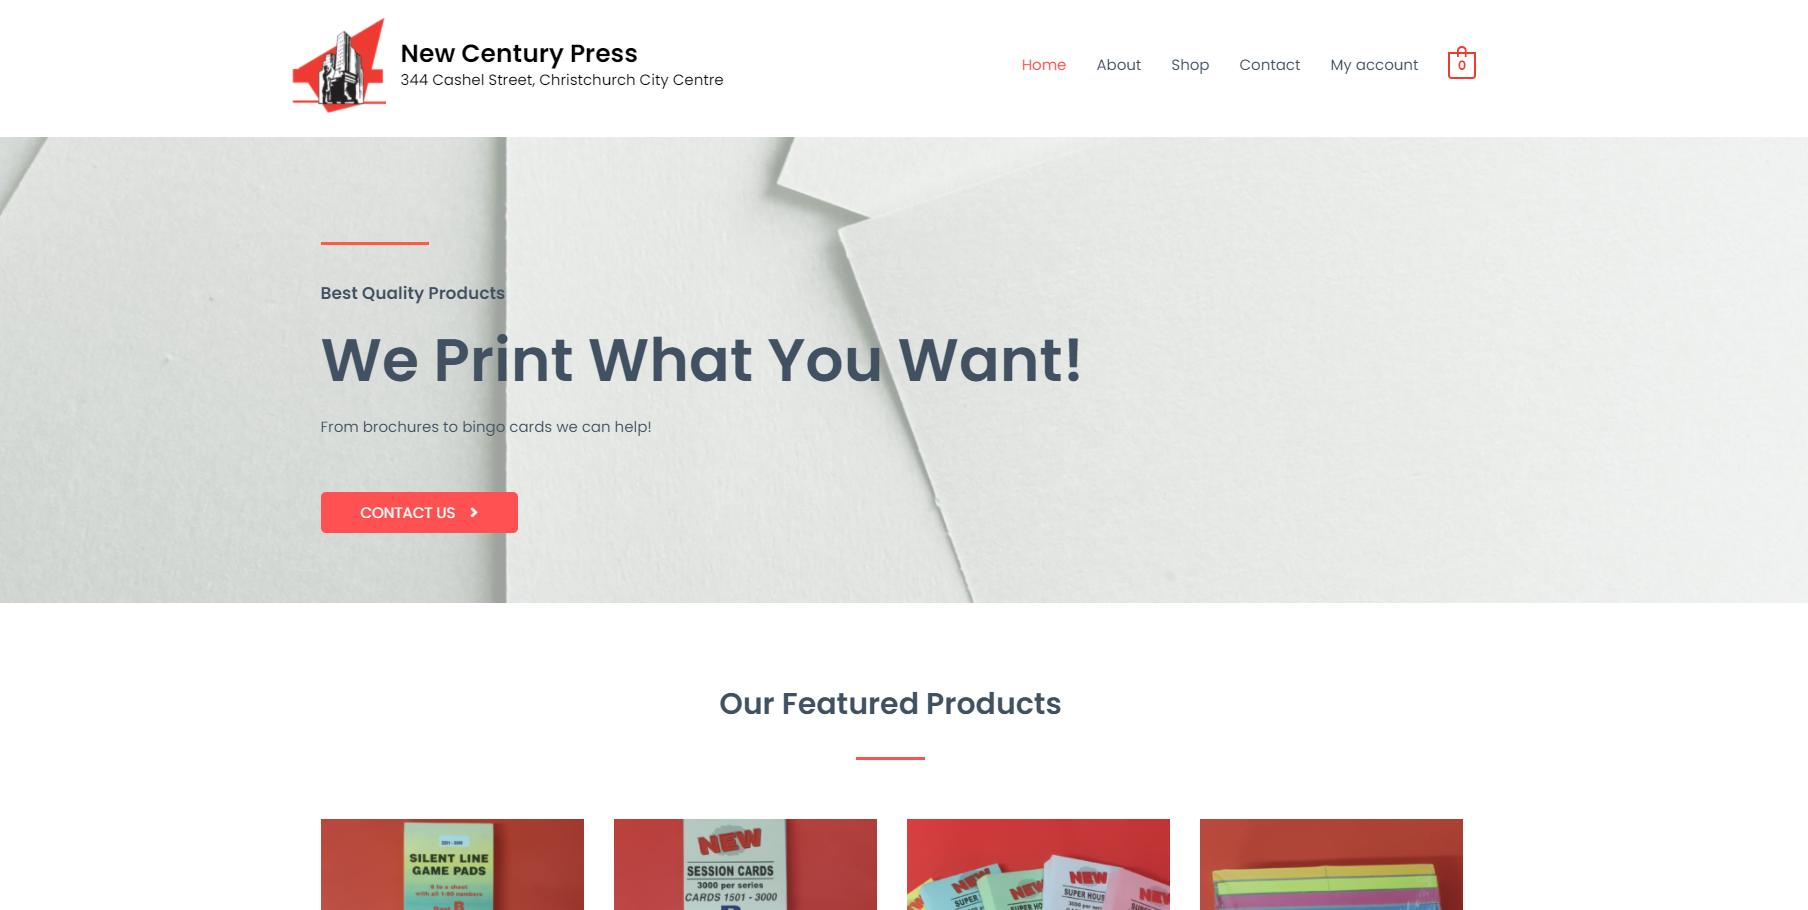 New Century Press